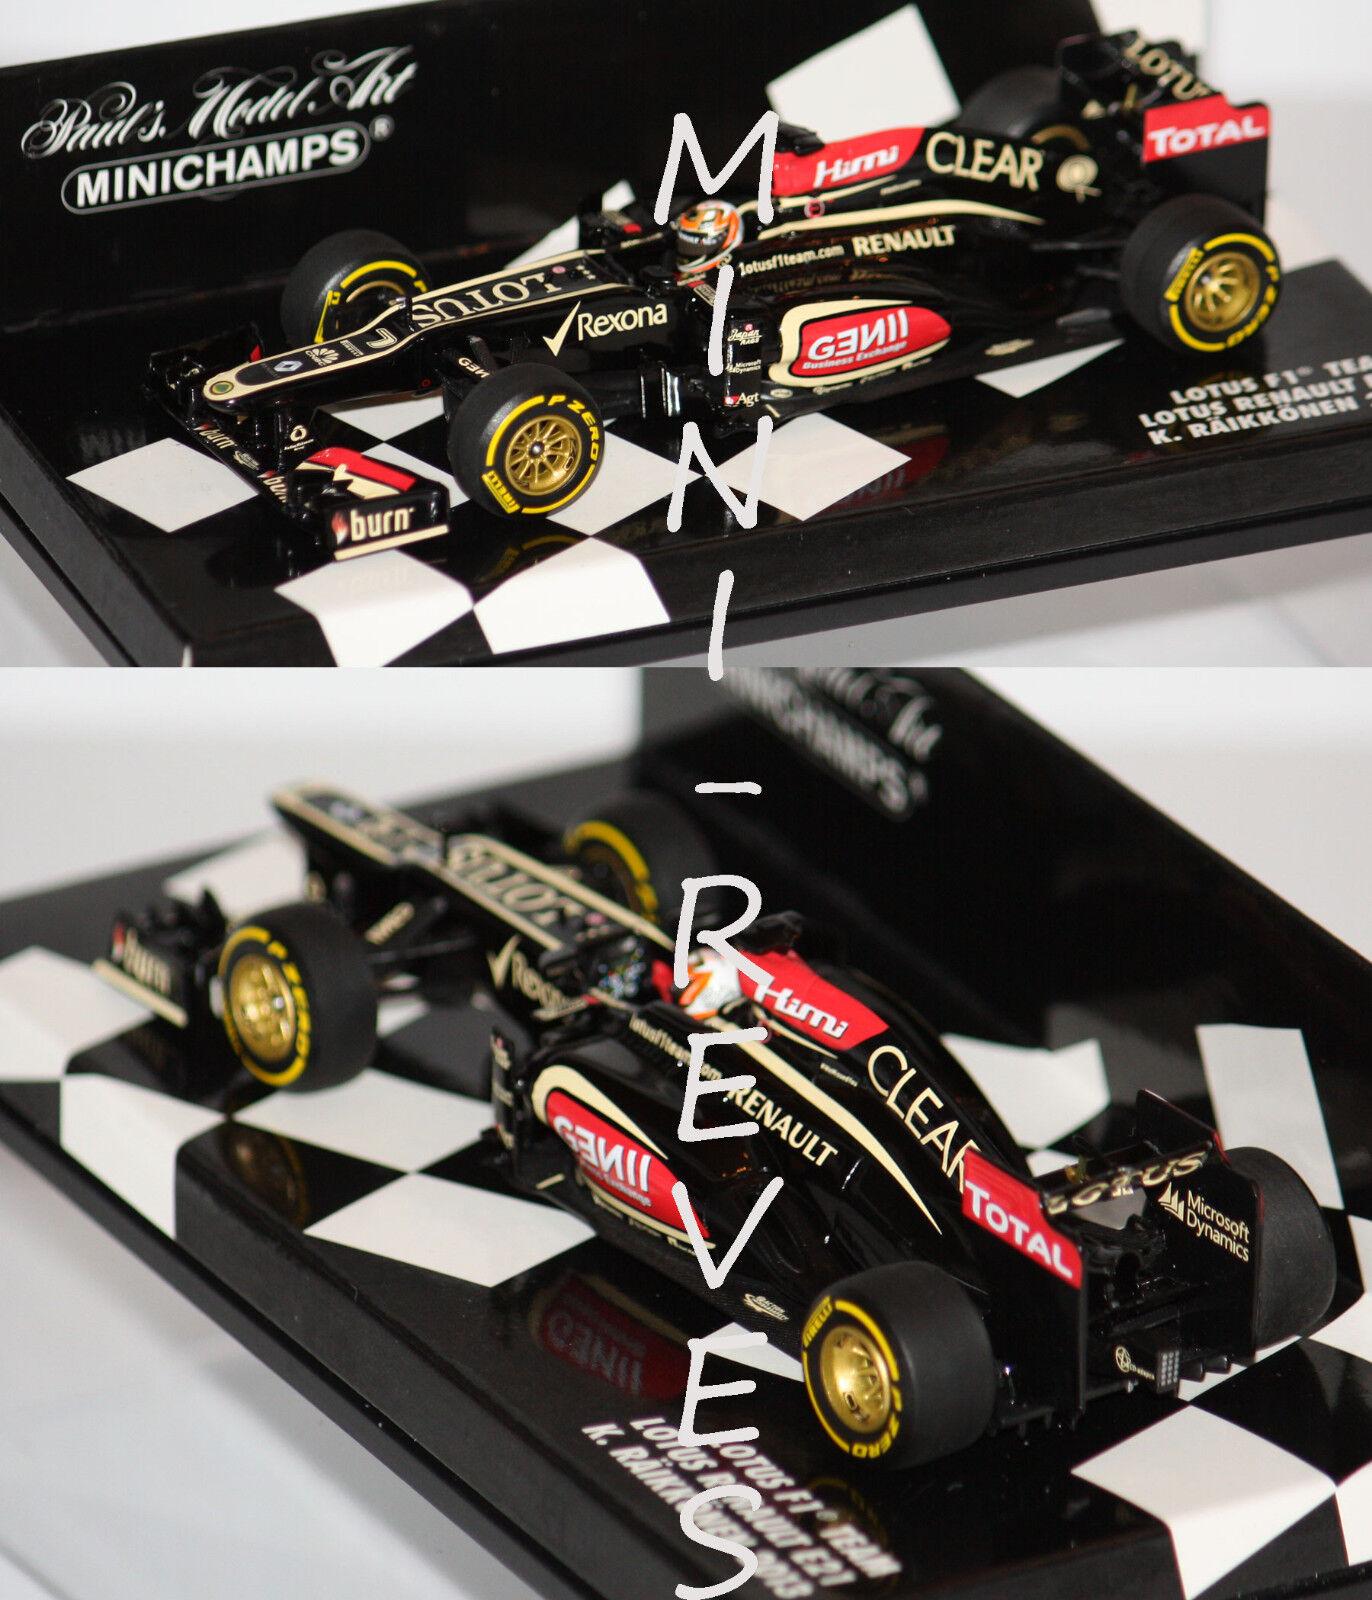 Minichamps F1 Lotus Renault E21 Showvoiture  2013 K. Raikkonen 1 43 410130007  magasin discount